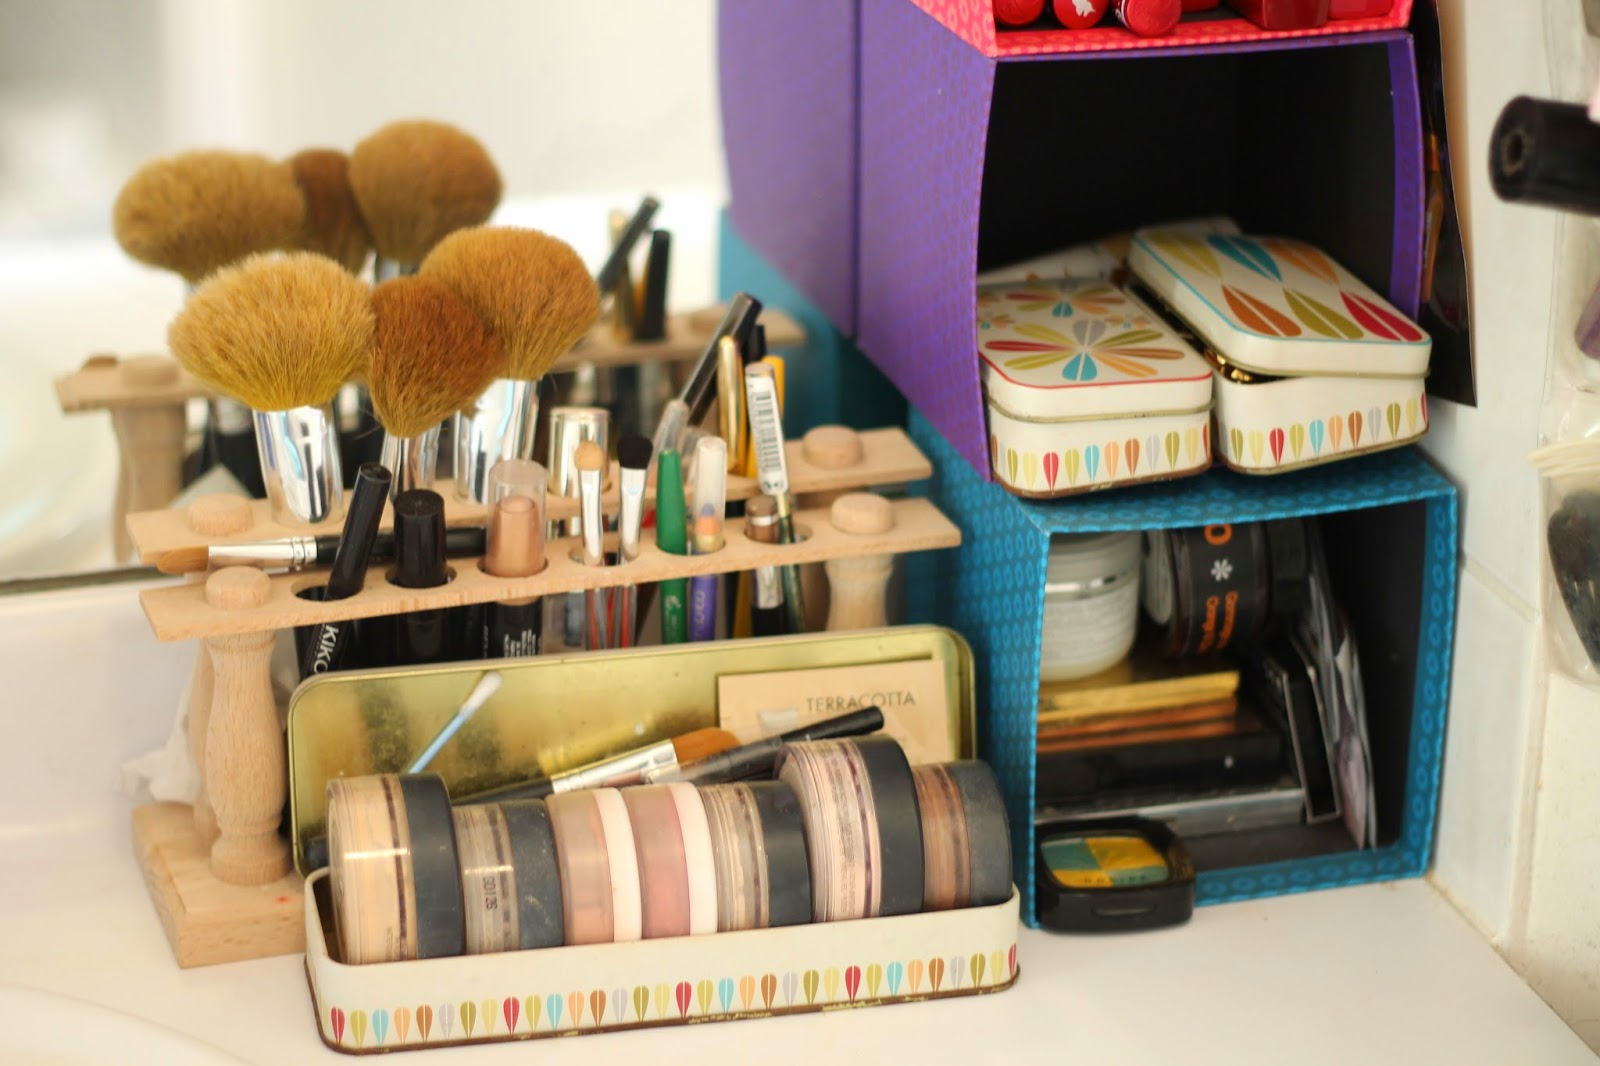 deco salle de bain comment recycler ses objets usuels. Black Bedroom Furniture Sets. Home Design Ideas